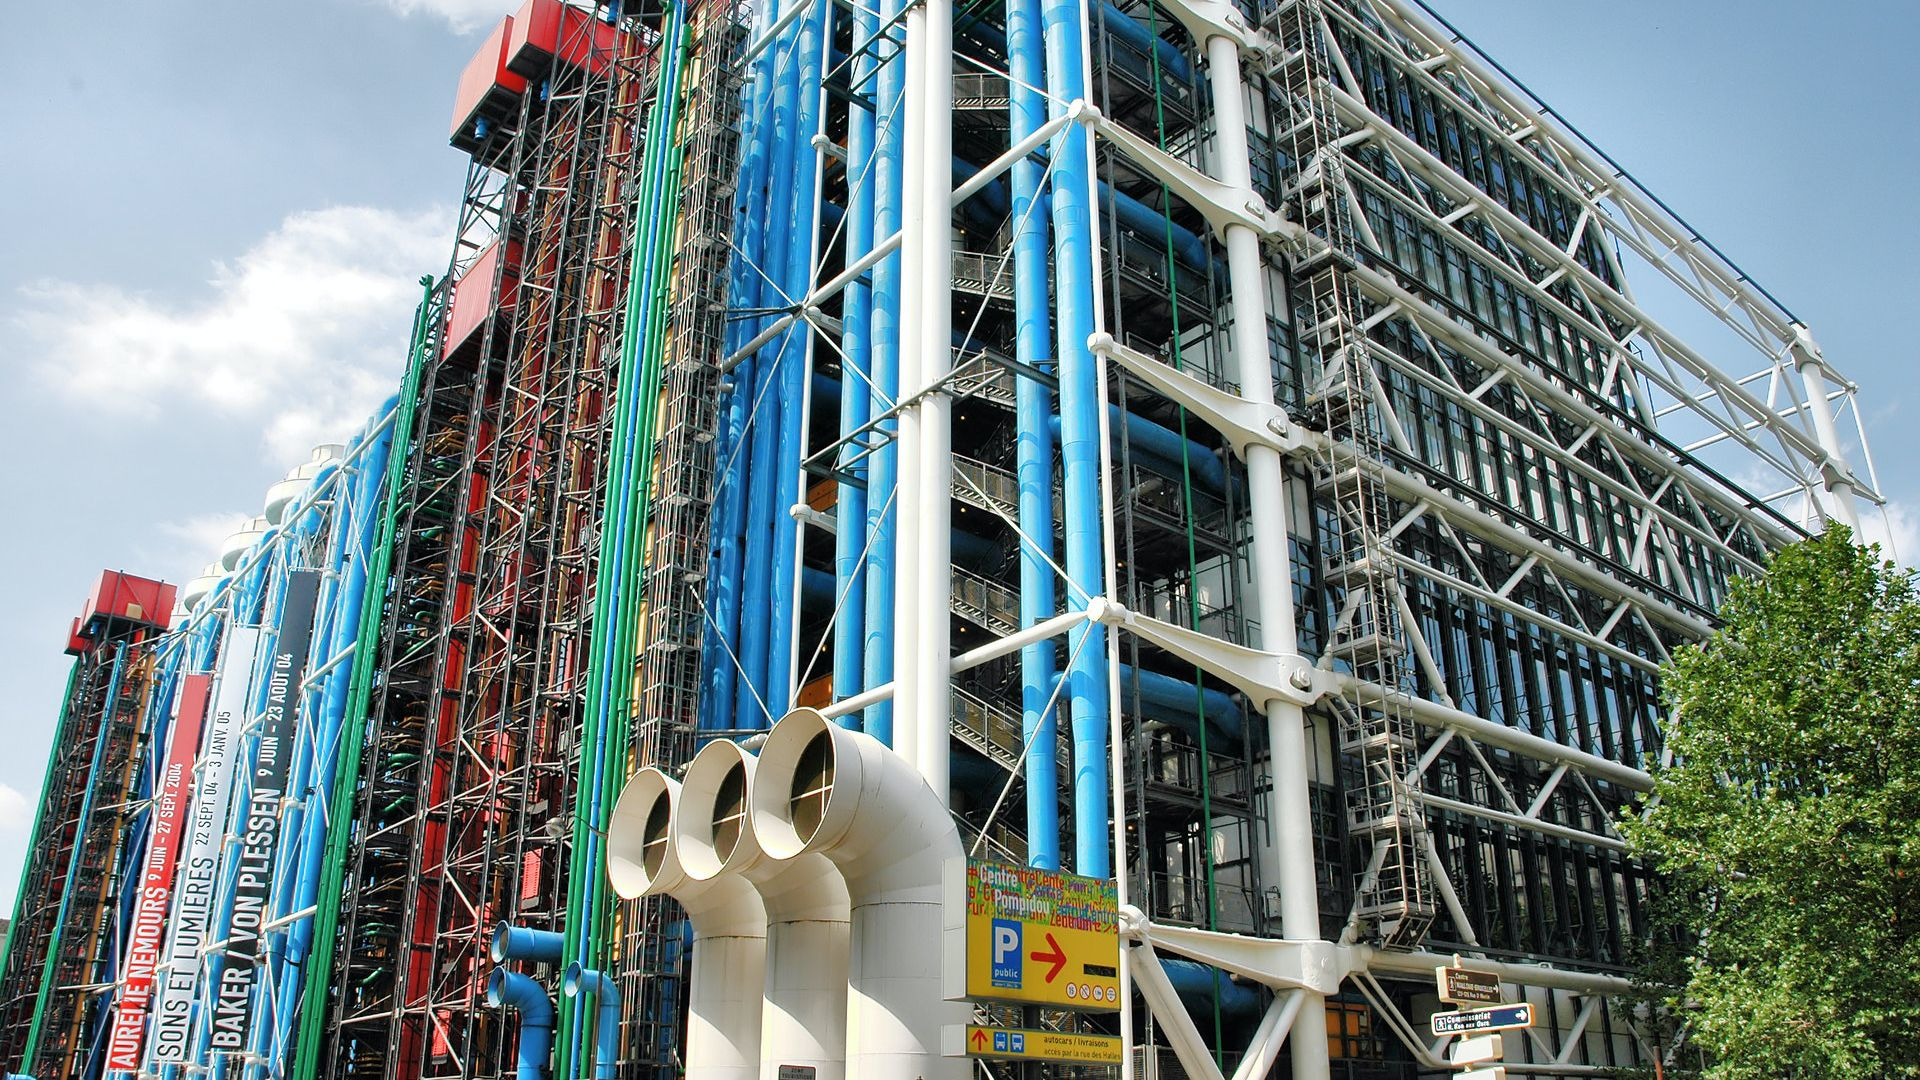 Centre Pompidou: Christo and Jeanne-Claude Exhibition